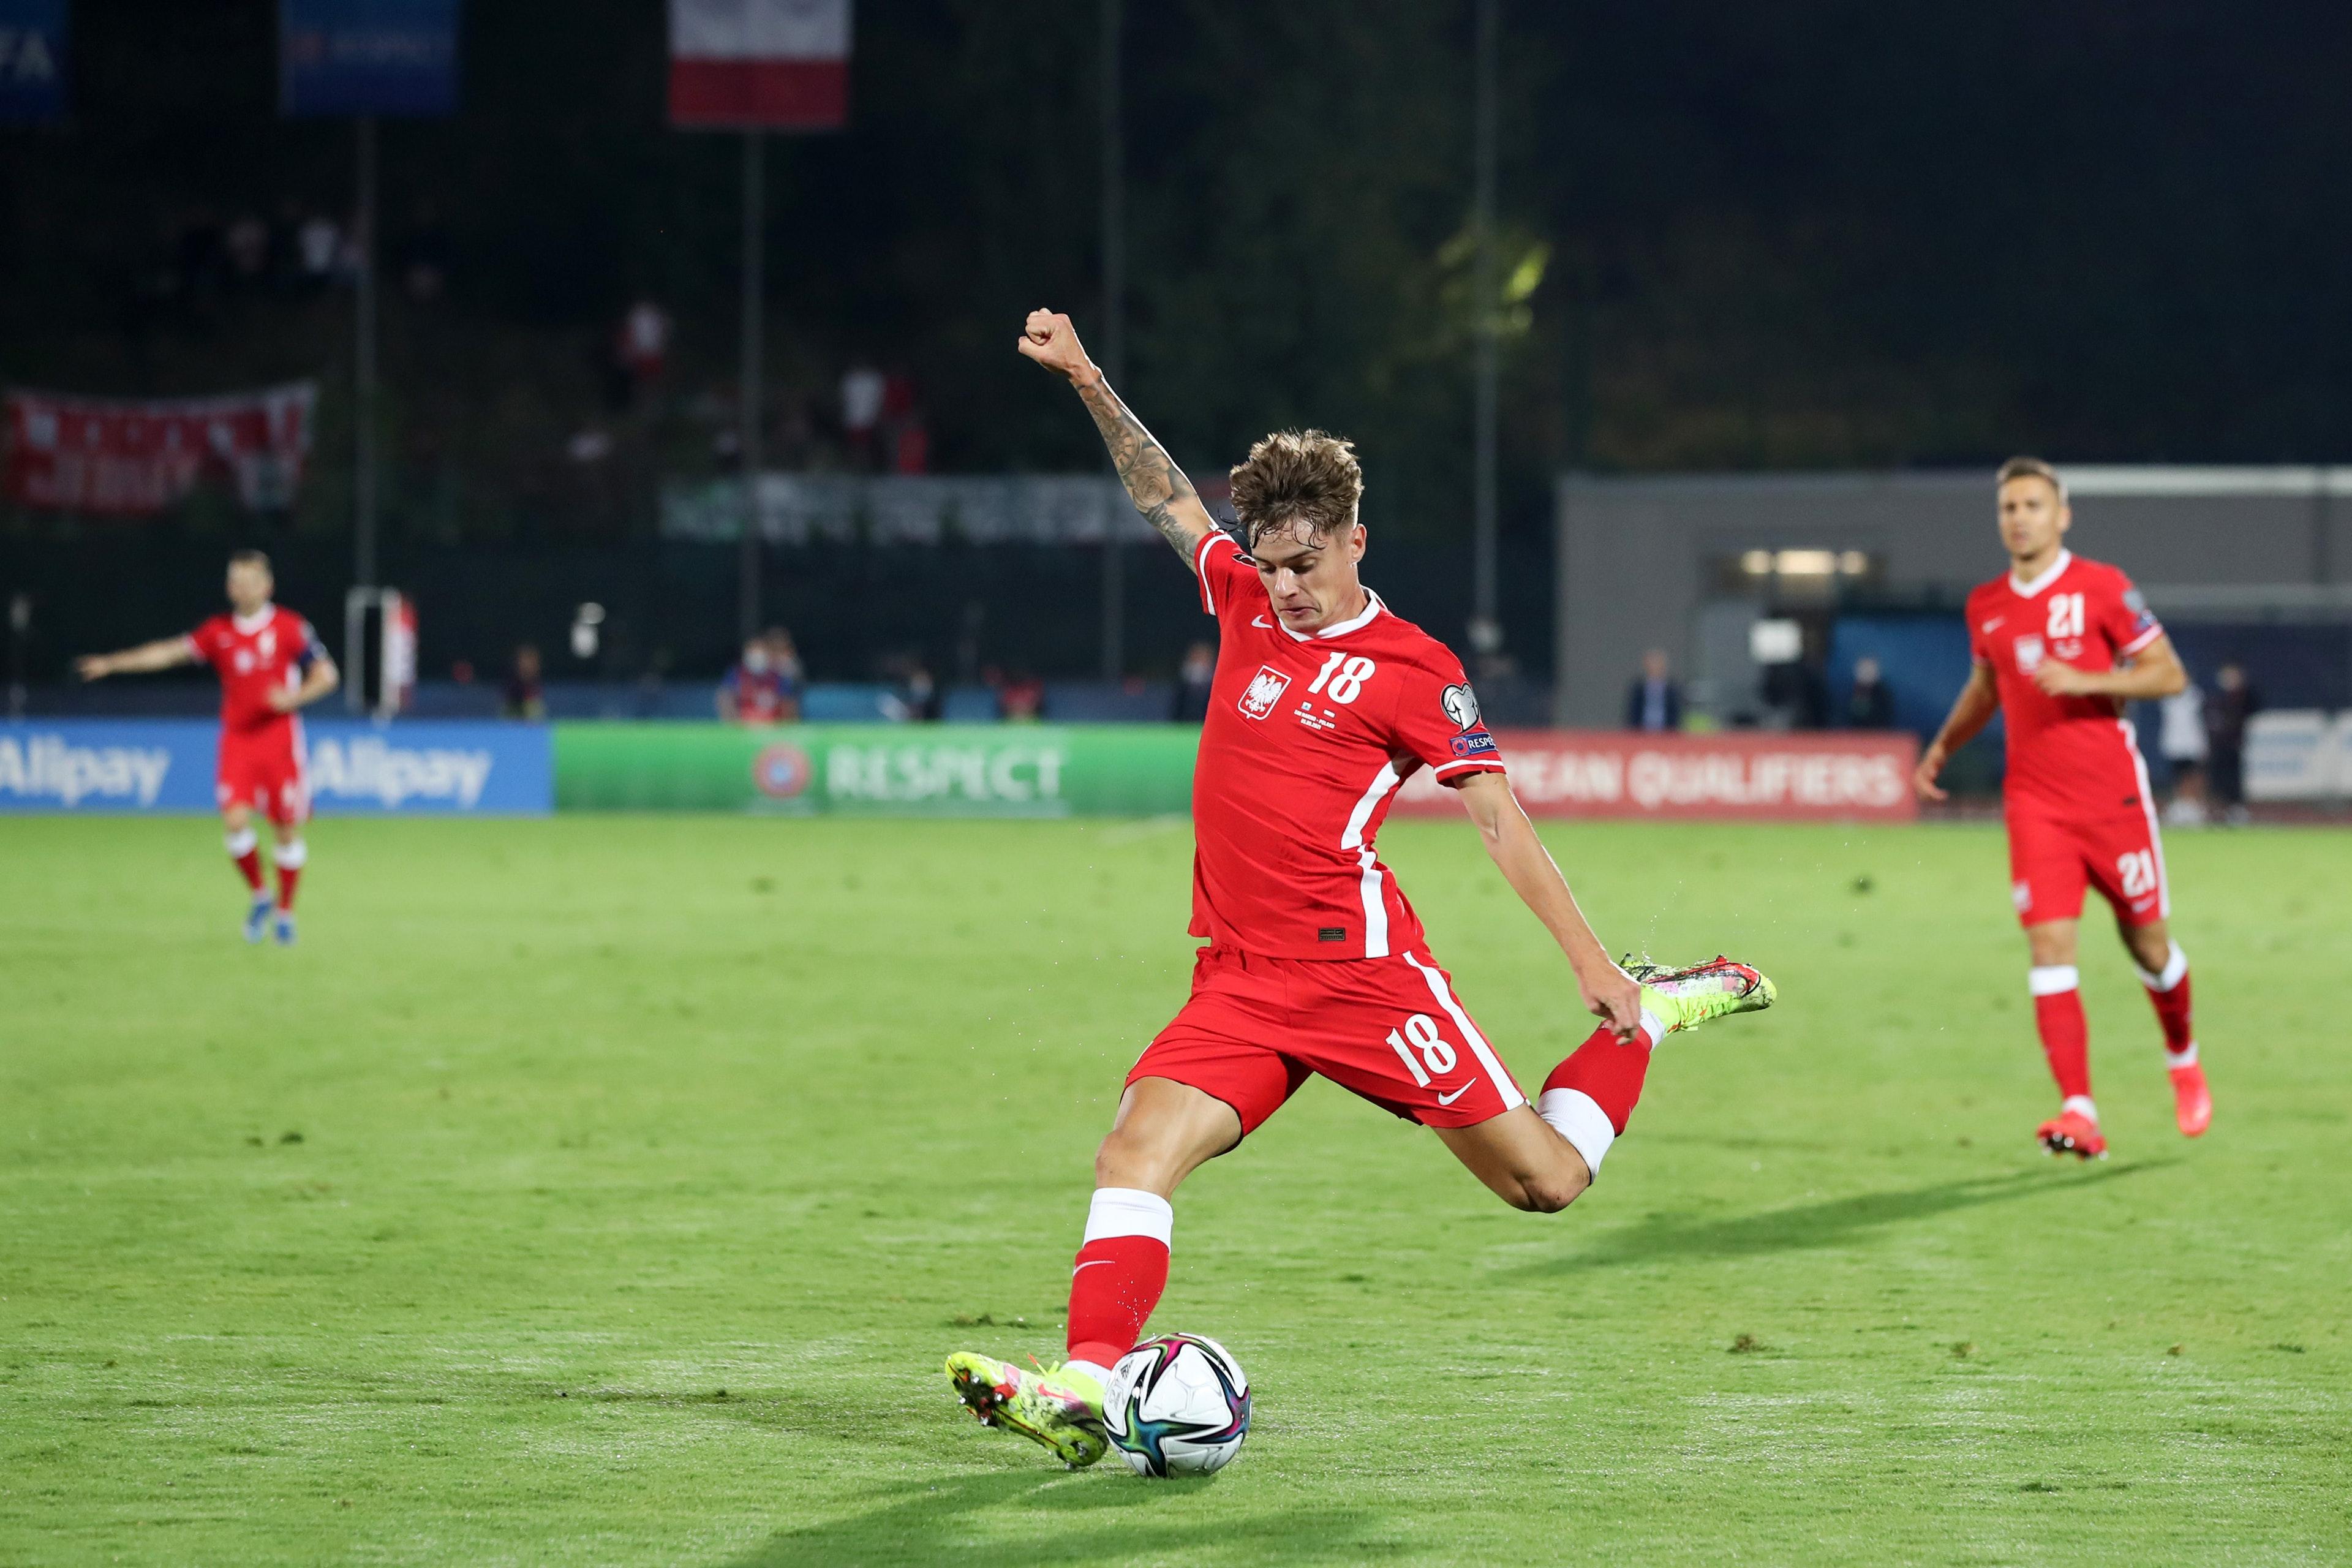 Pilka nozna. Eliminacje do MS 2022. San Marino - Polska. 05.09.2021